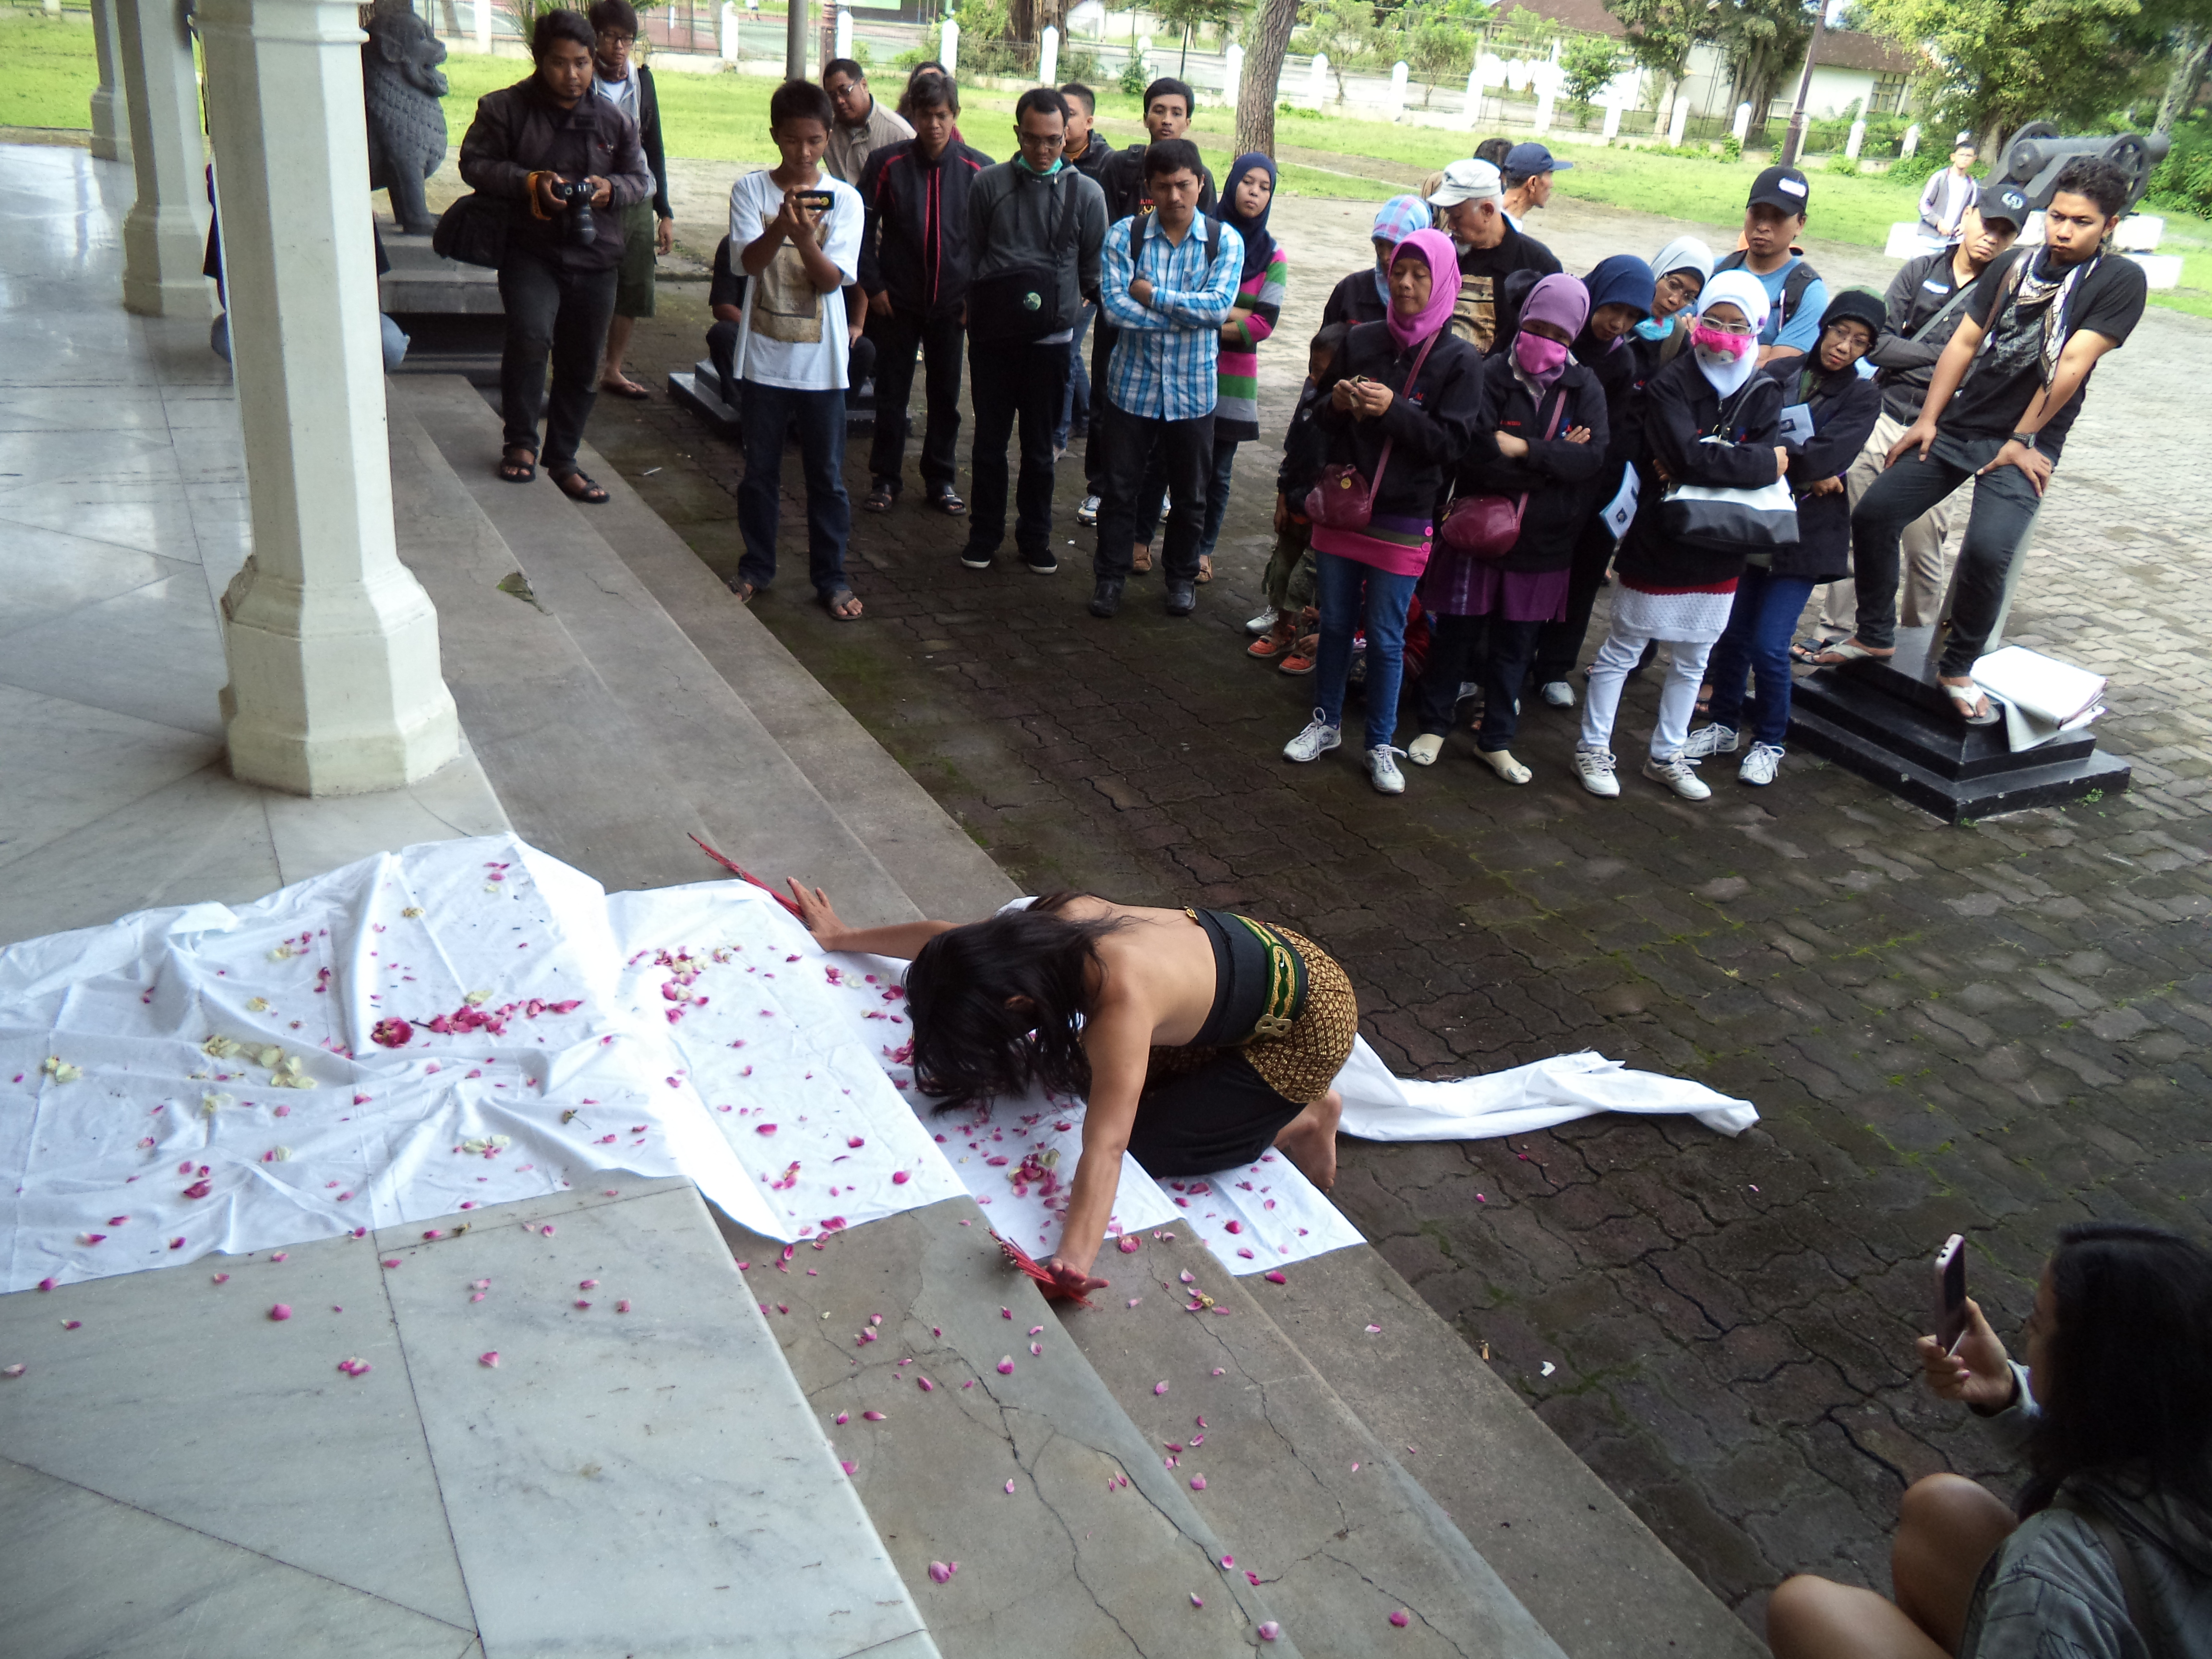 Menyusuri Petilasan Pangeran Diponegoro Widoyoko Magelang Ruangan Perundingan Antara Letnan